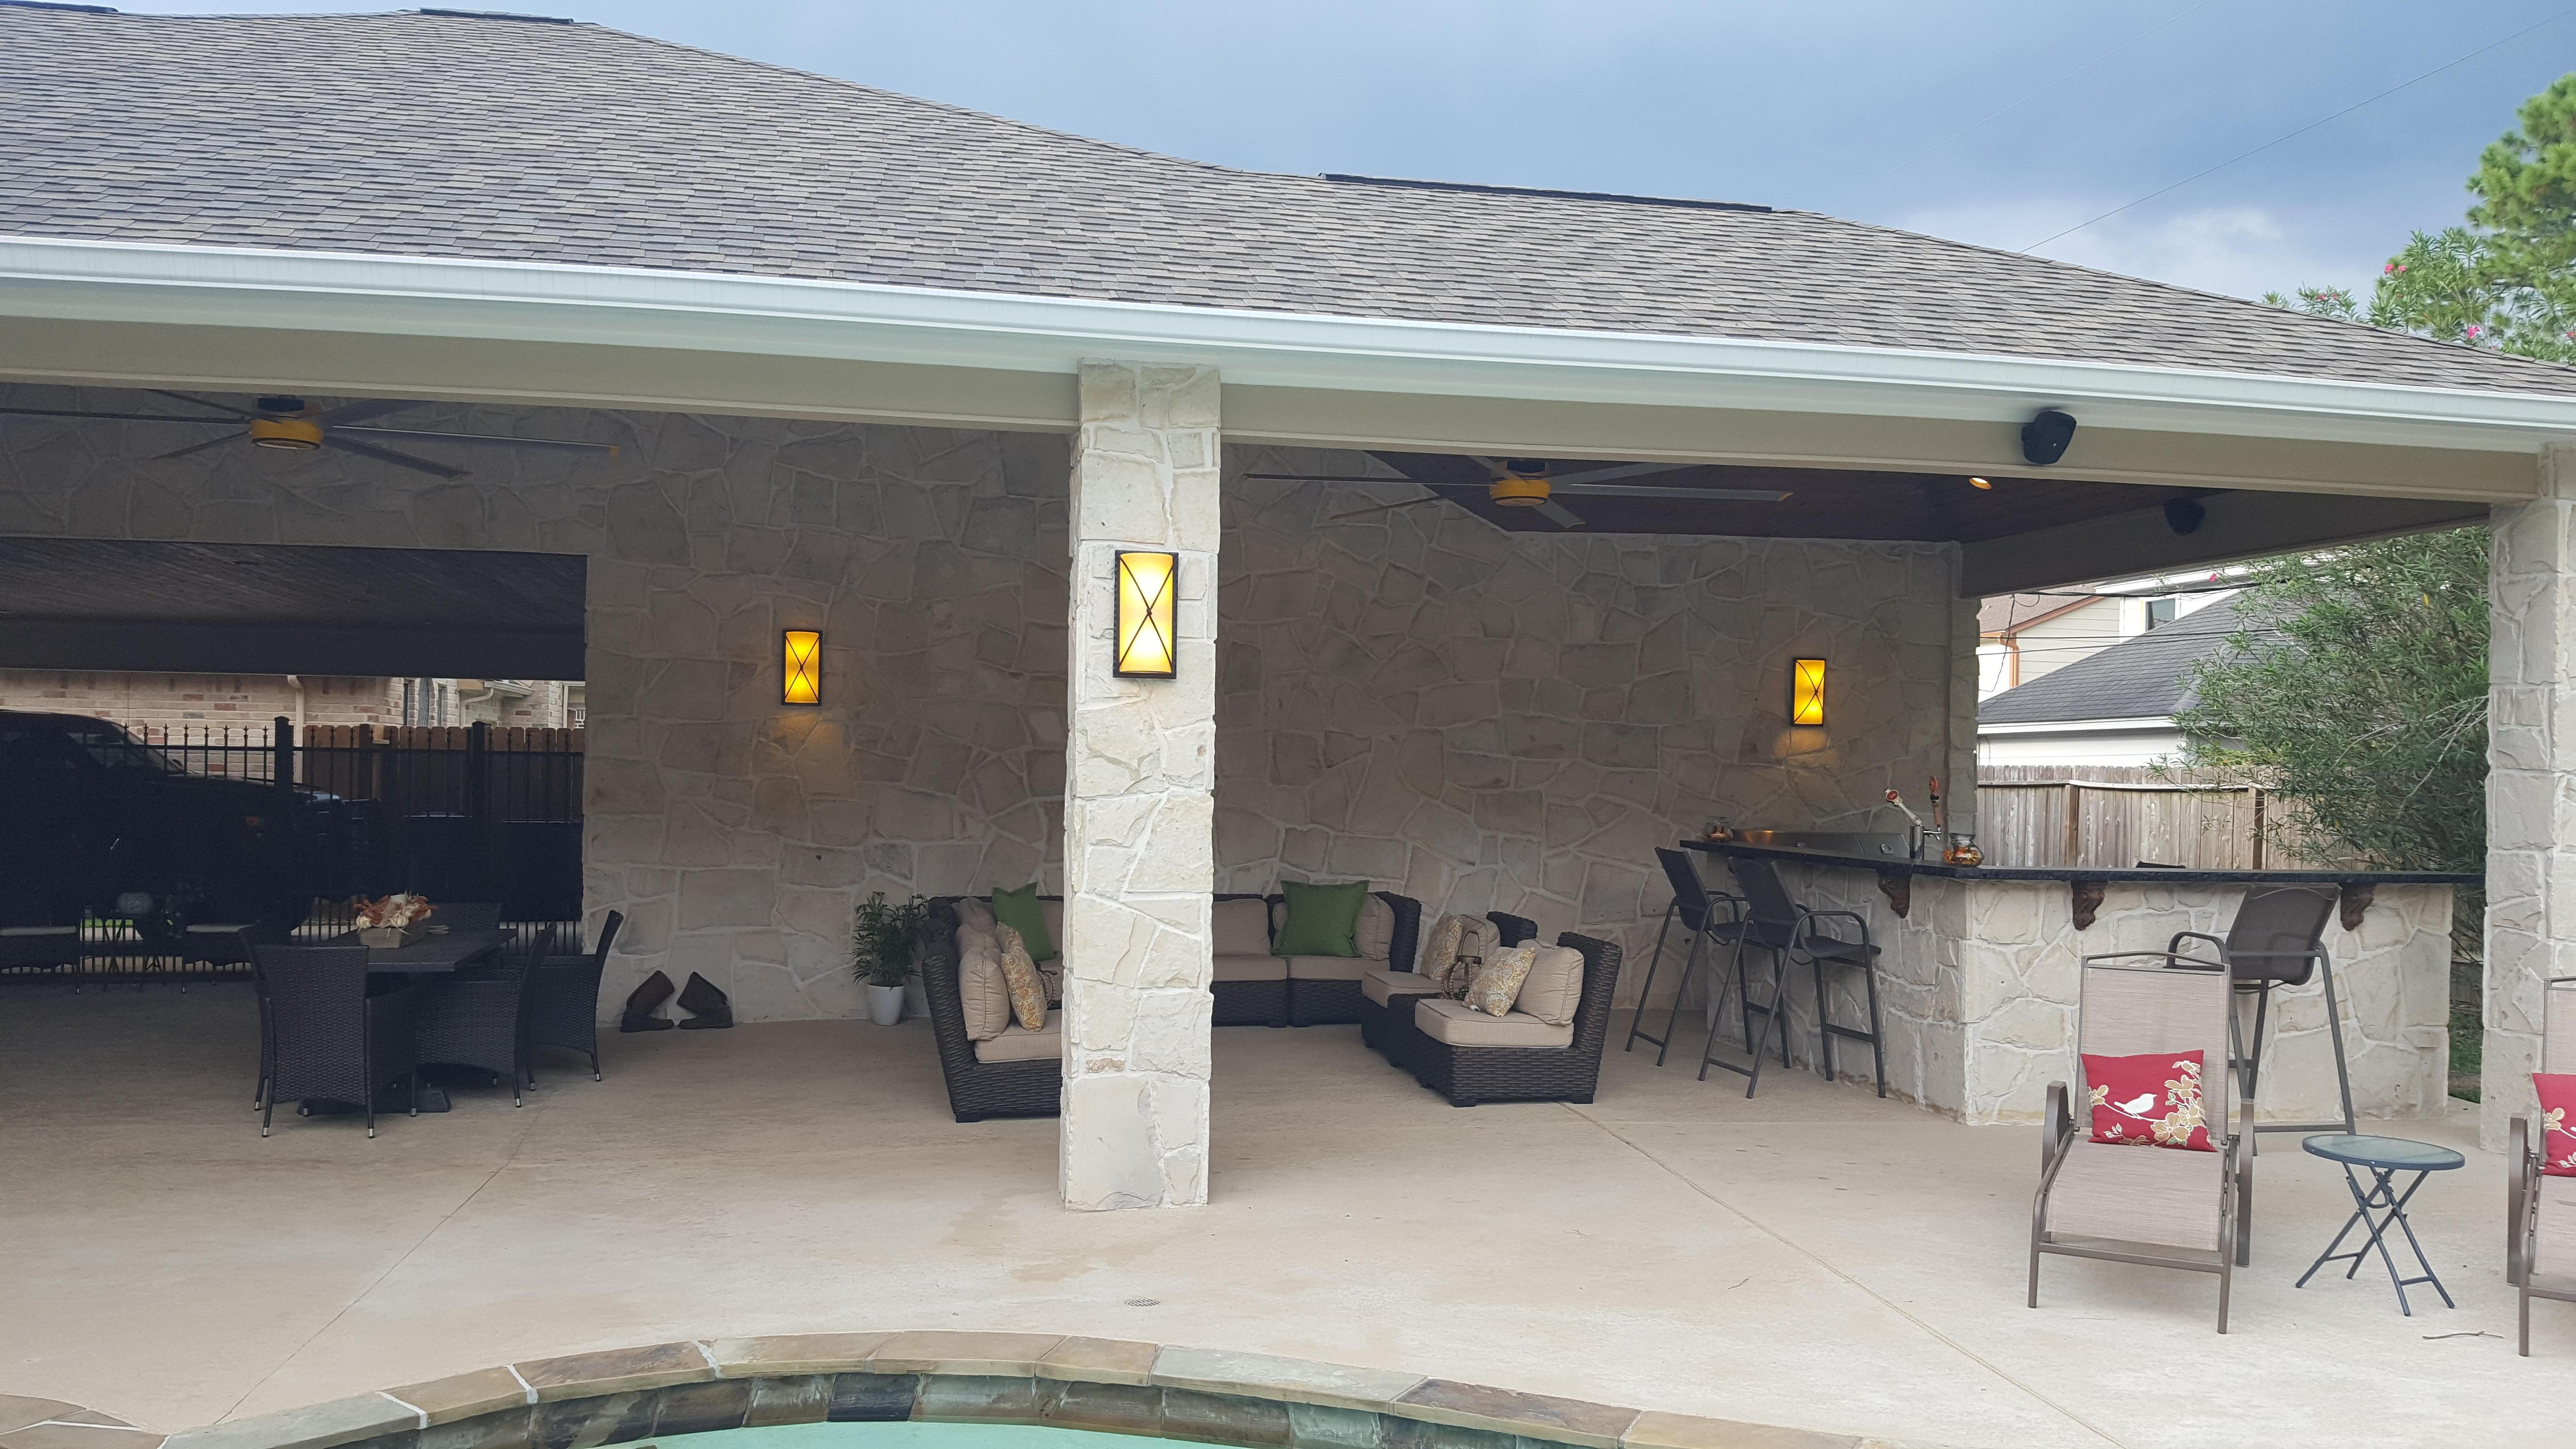 Lone Star Patio Builders 3724 FM 1960 Houston, TX Swimming Pool Enclosures    MapQuest